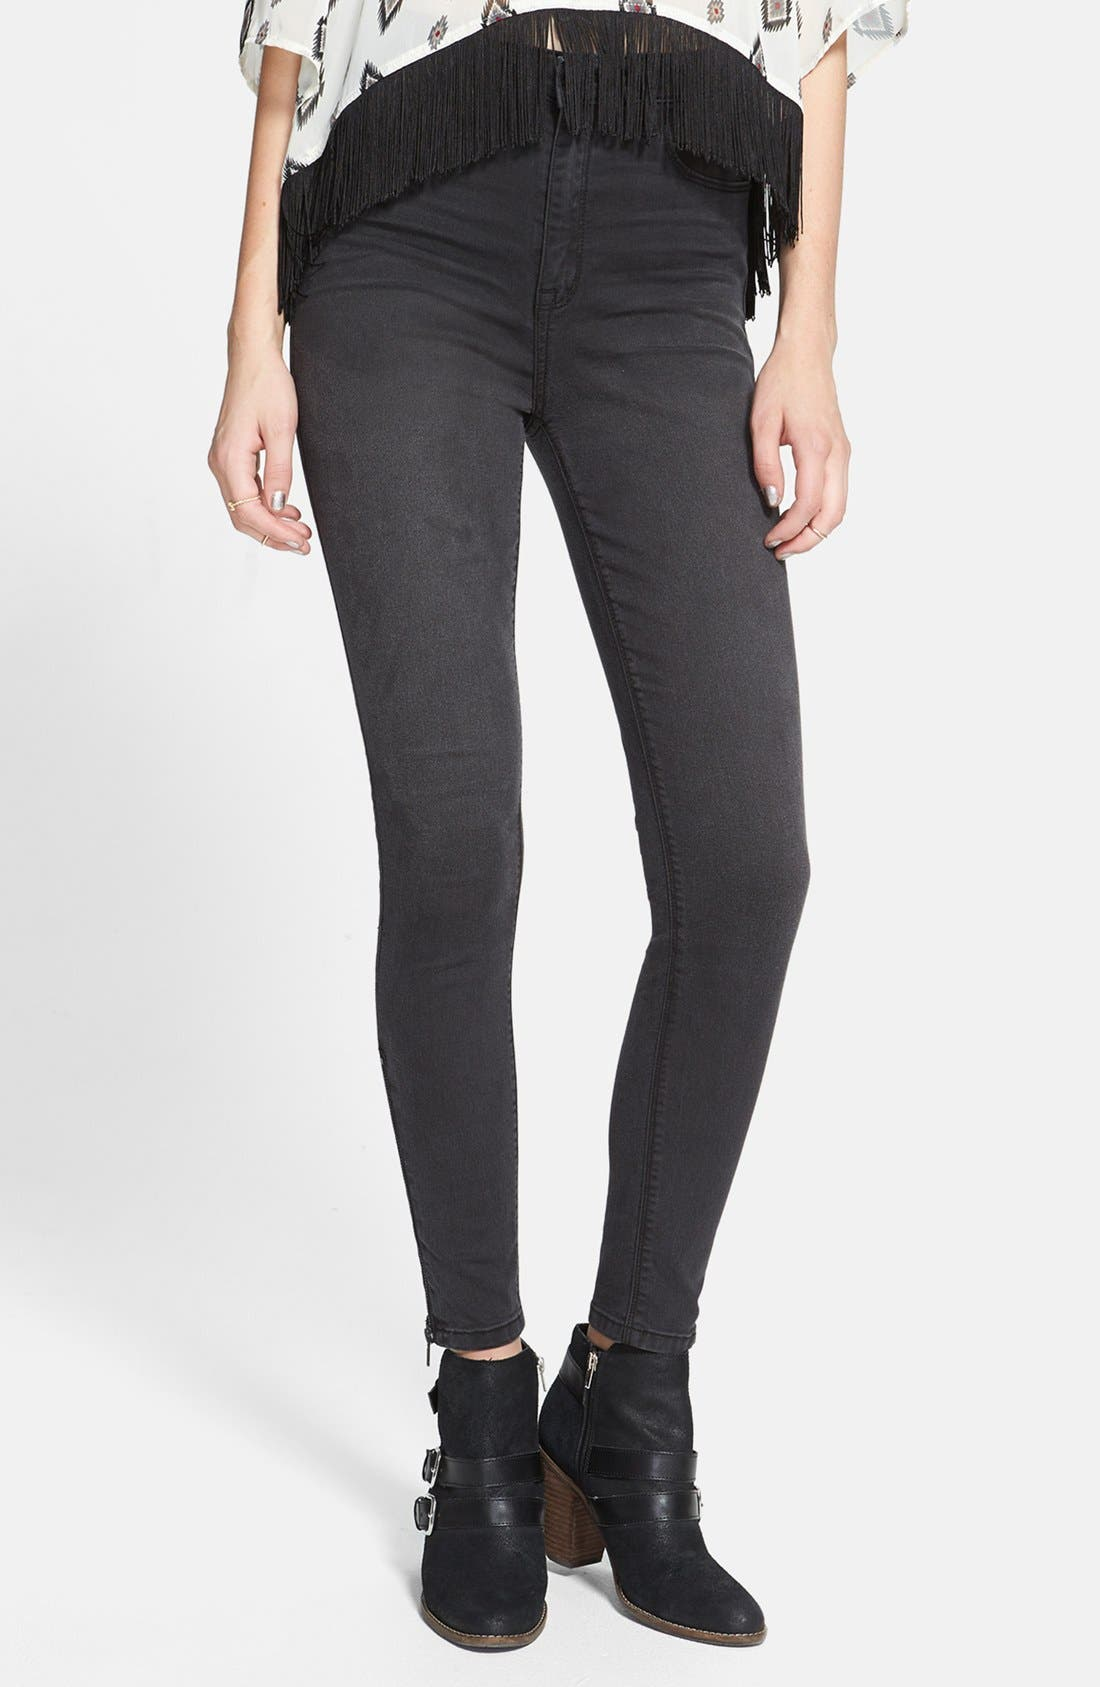 Main Image - SP Black High Waist Ankle Zip Skinny Jeans (Dark Grey) (Juniors) (Online Only)